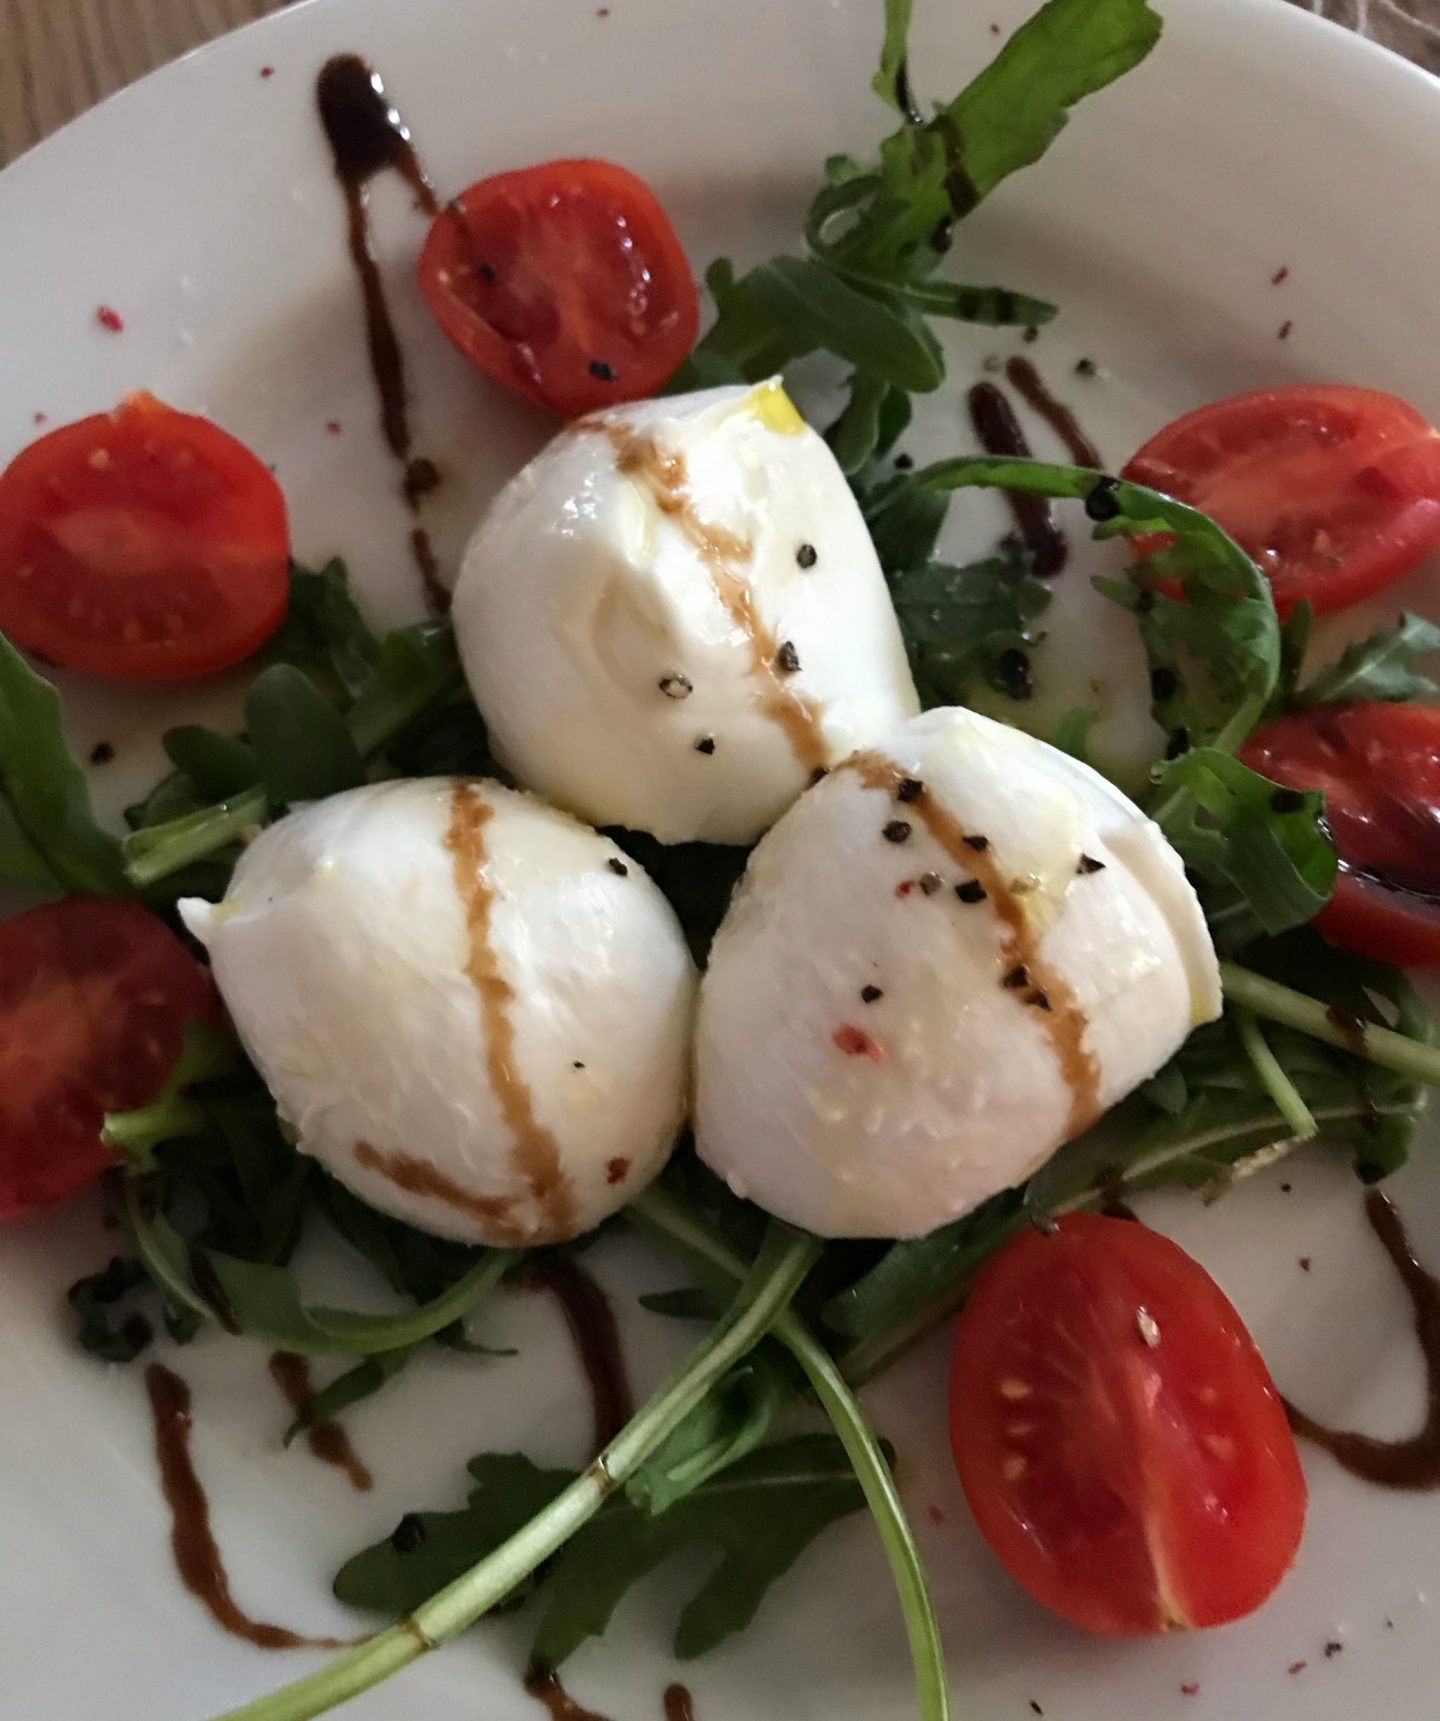 Büffelmozzarella Tomate Rucola Erfahrung Trattoria Villa Conte Herne Foodblog Sternestulle